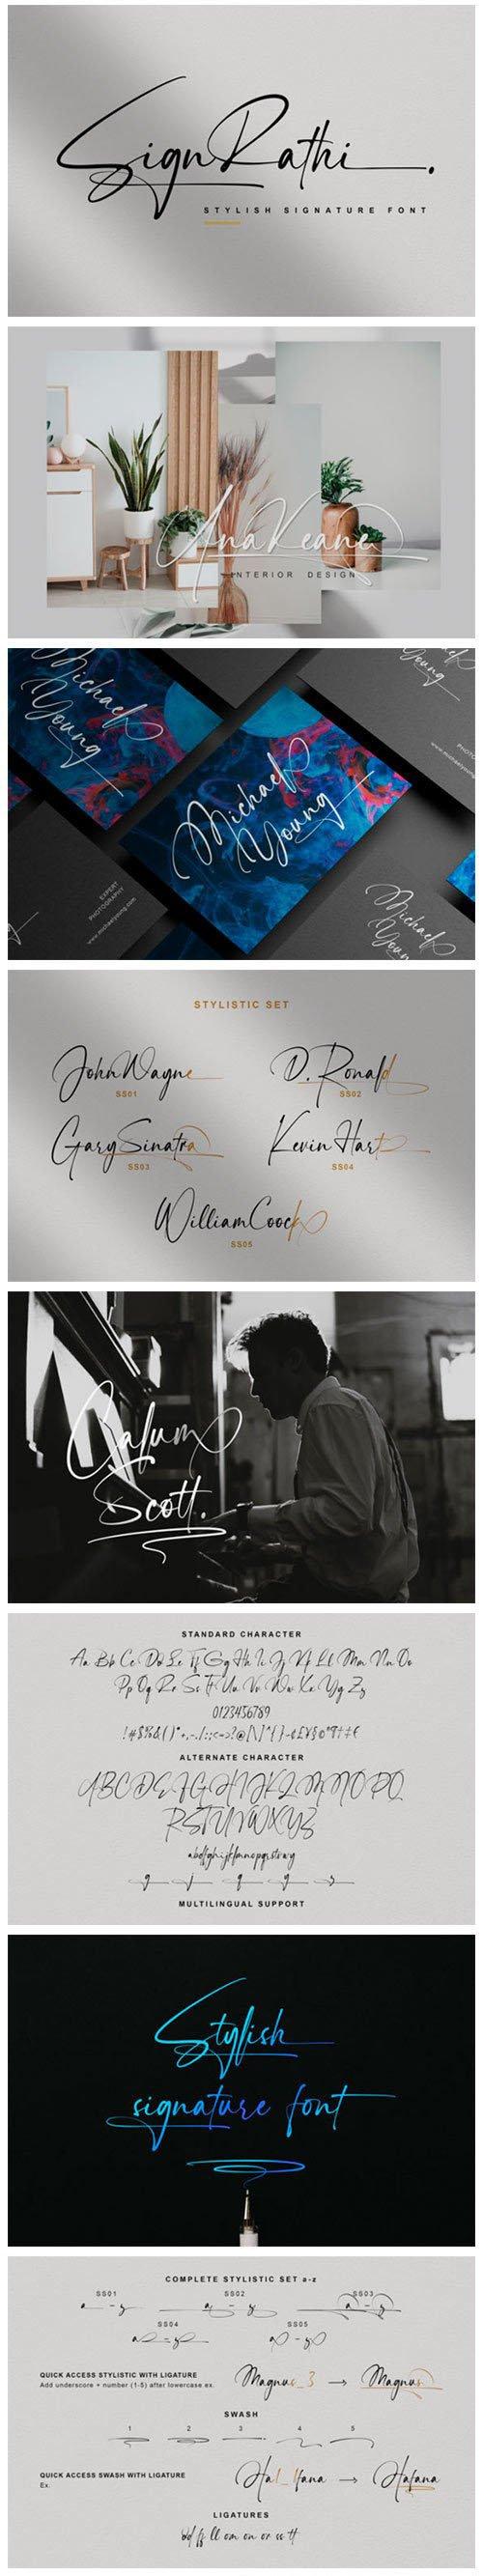 Sign Rathi Script - Stylish Signature Font